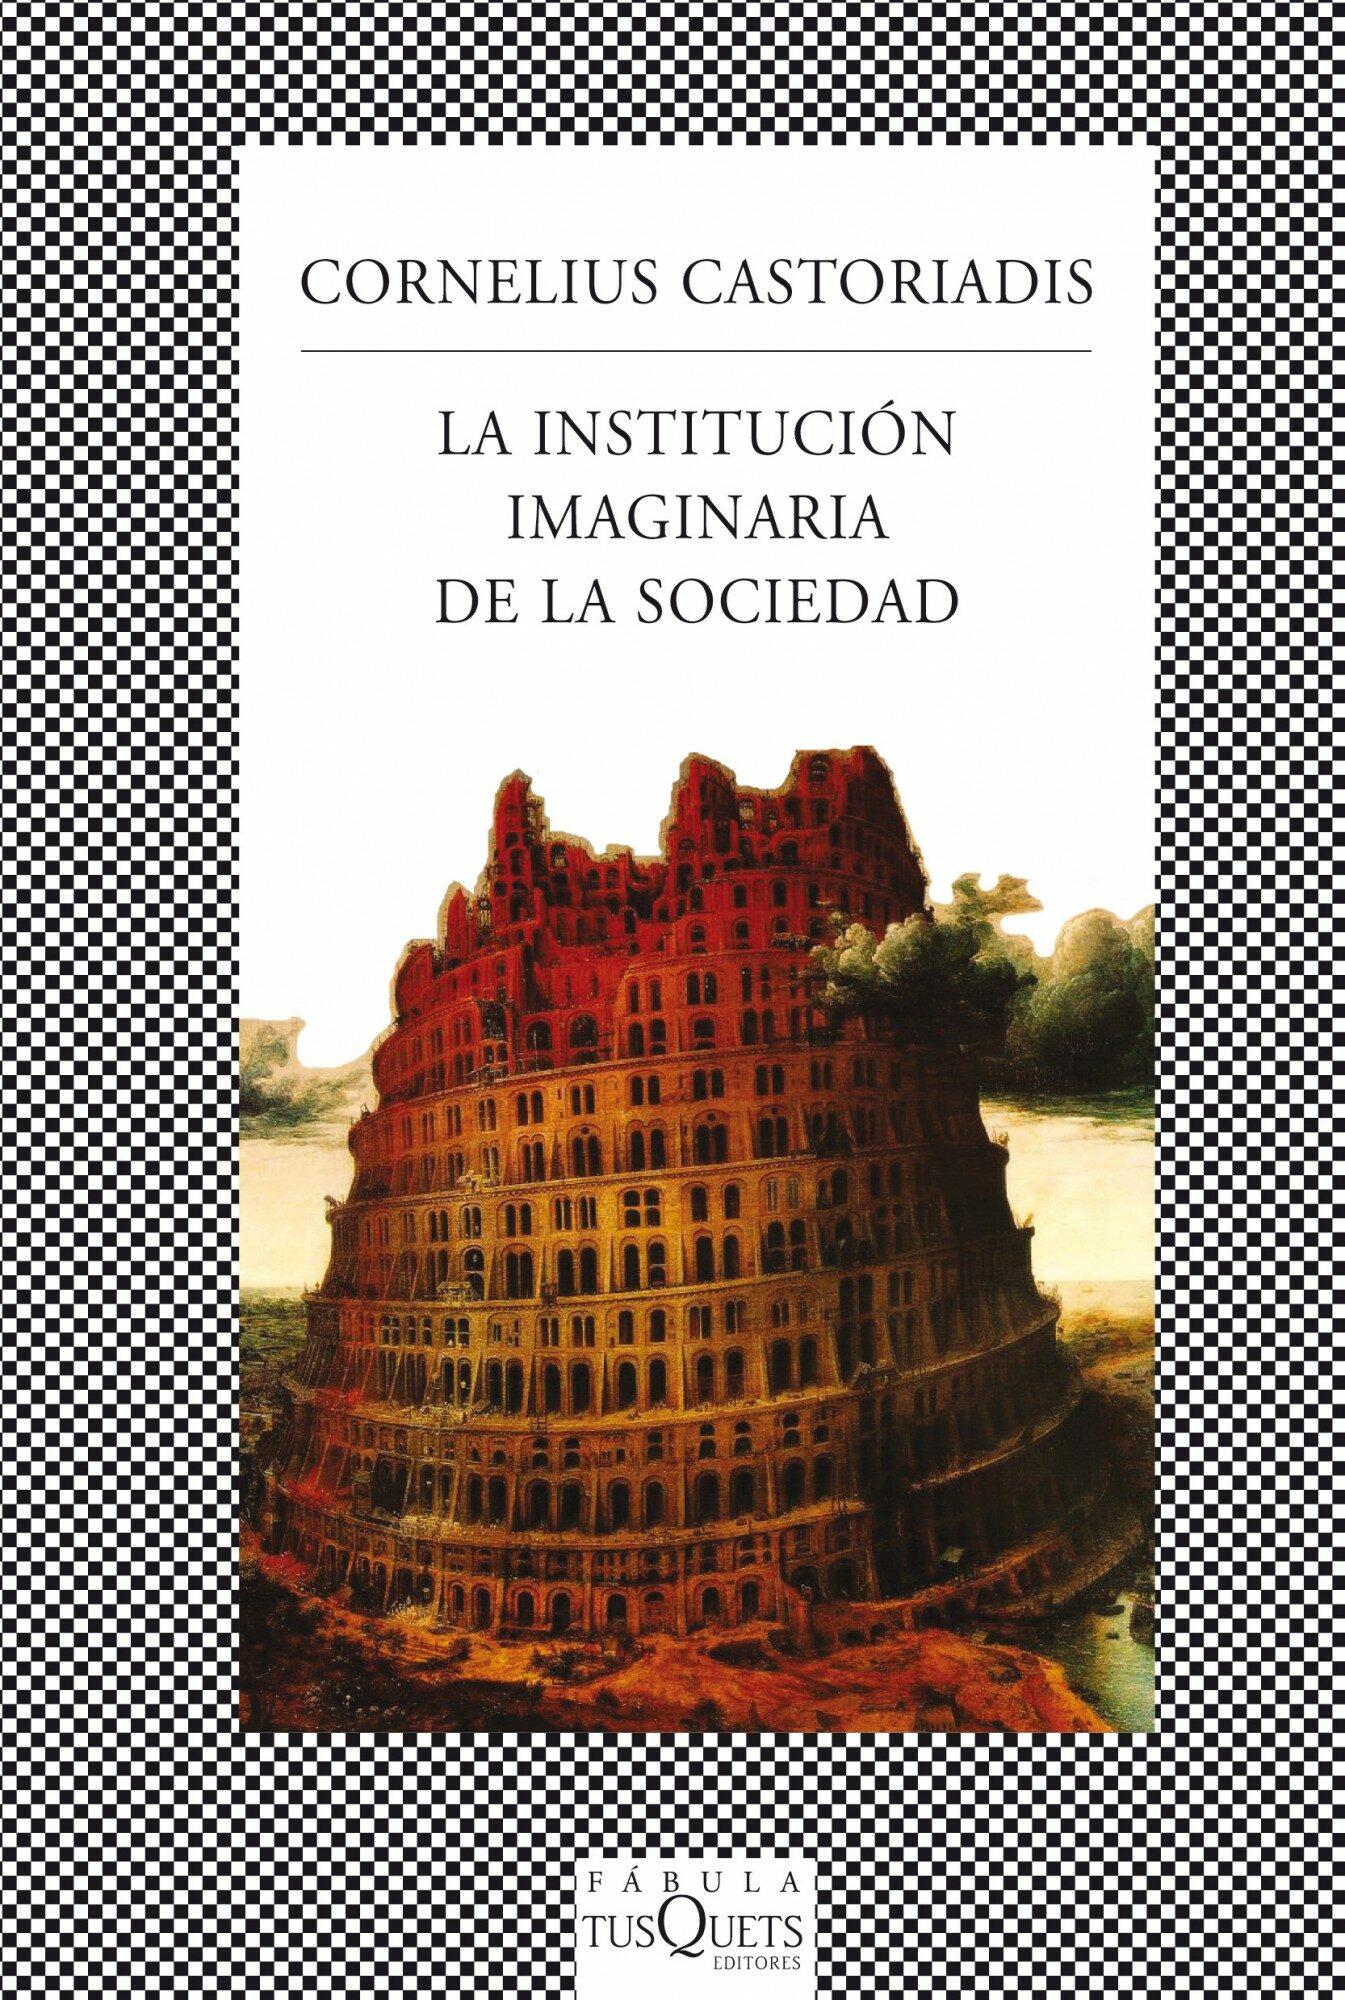 la institucion imaginaria de la sociedad-cornelius castoriadis-9788483834909